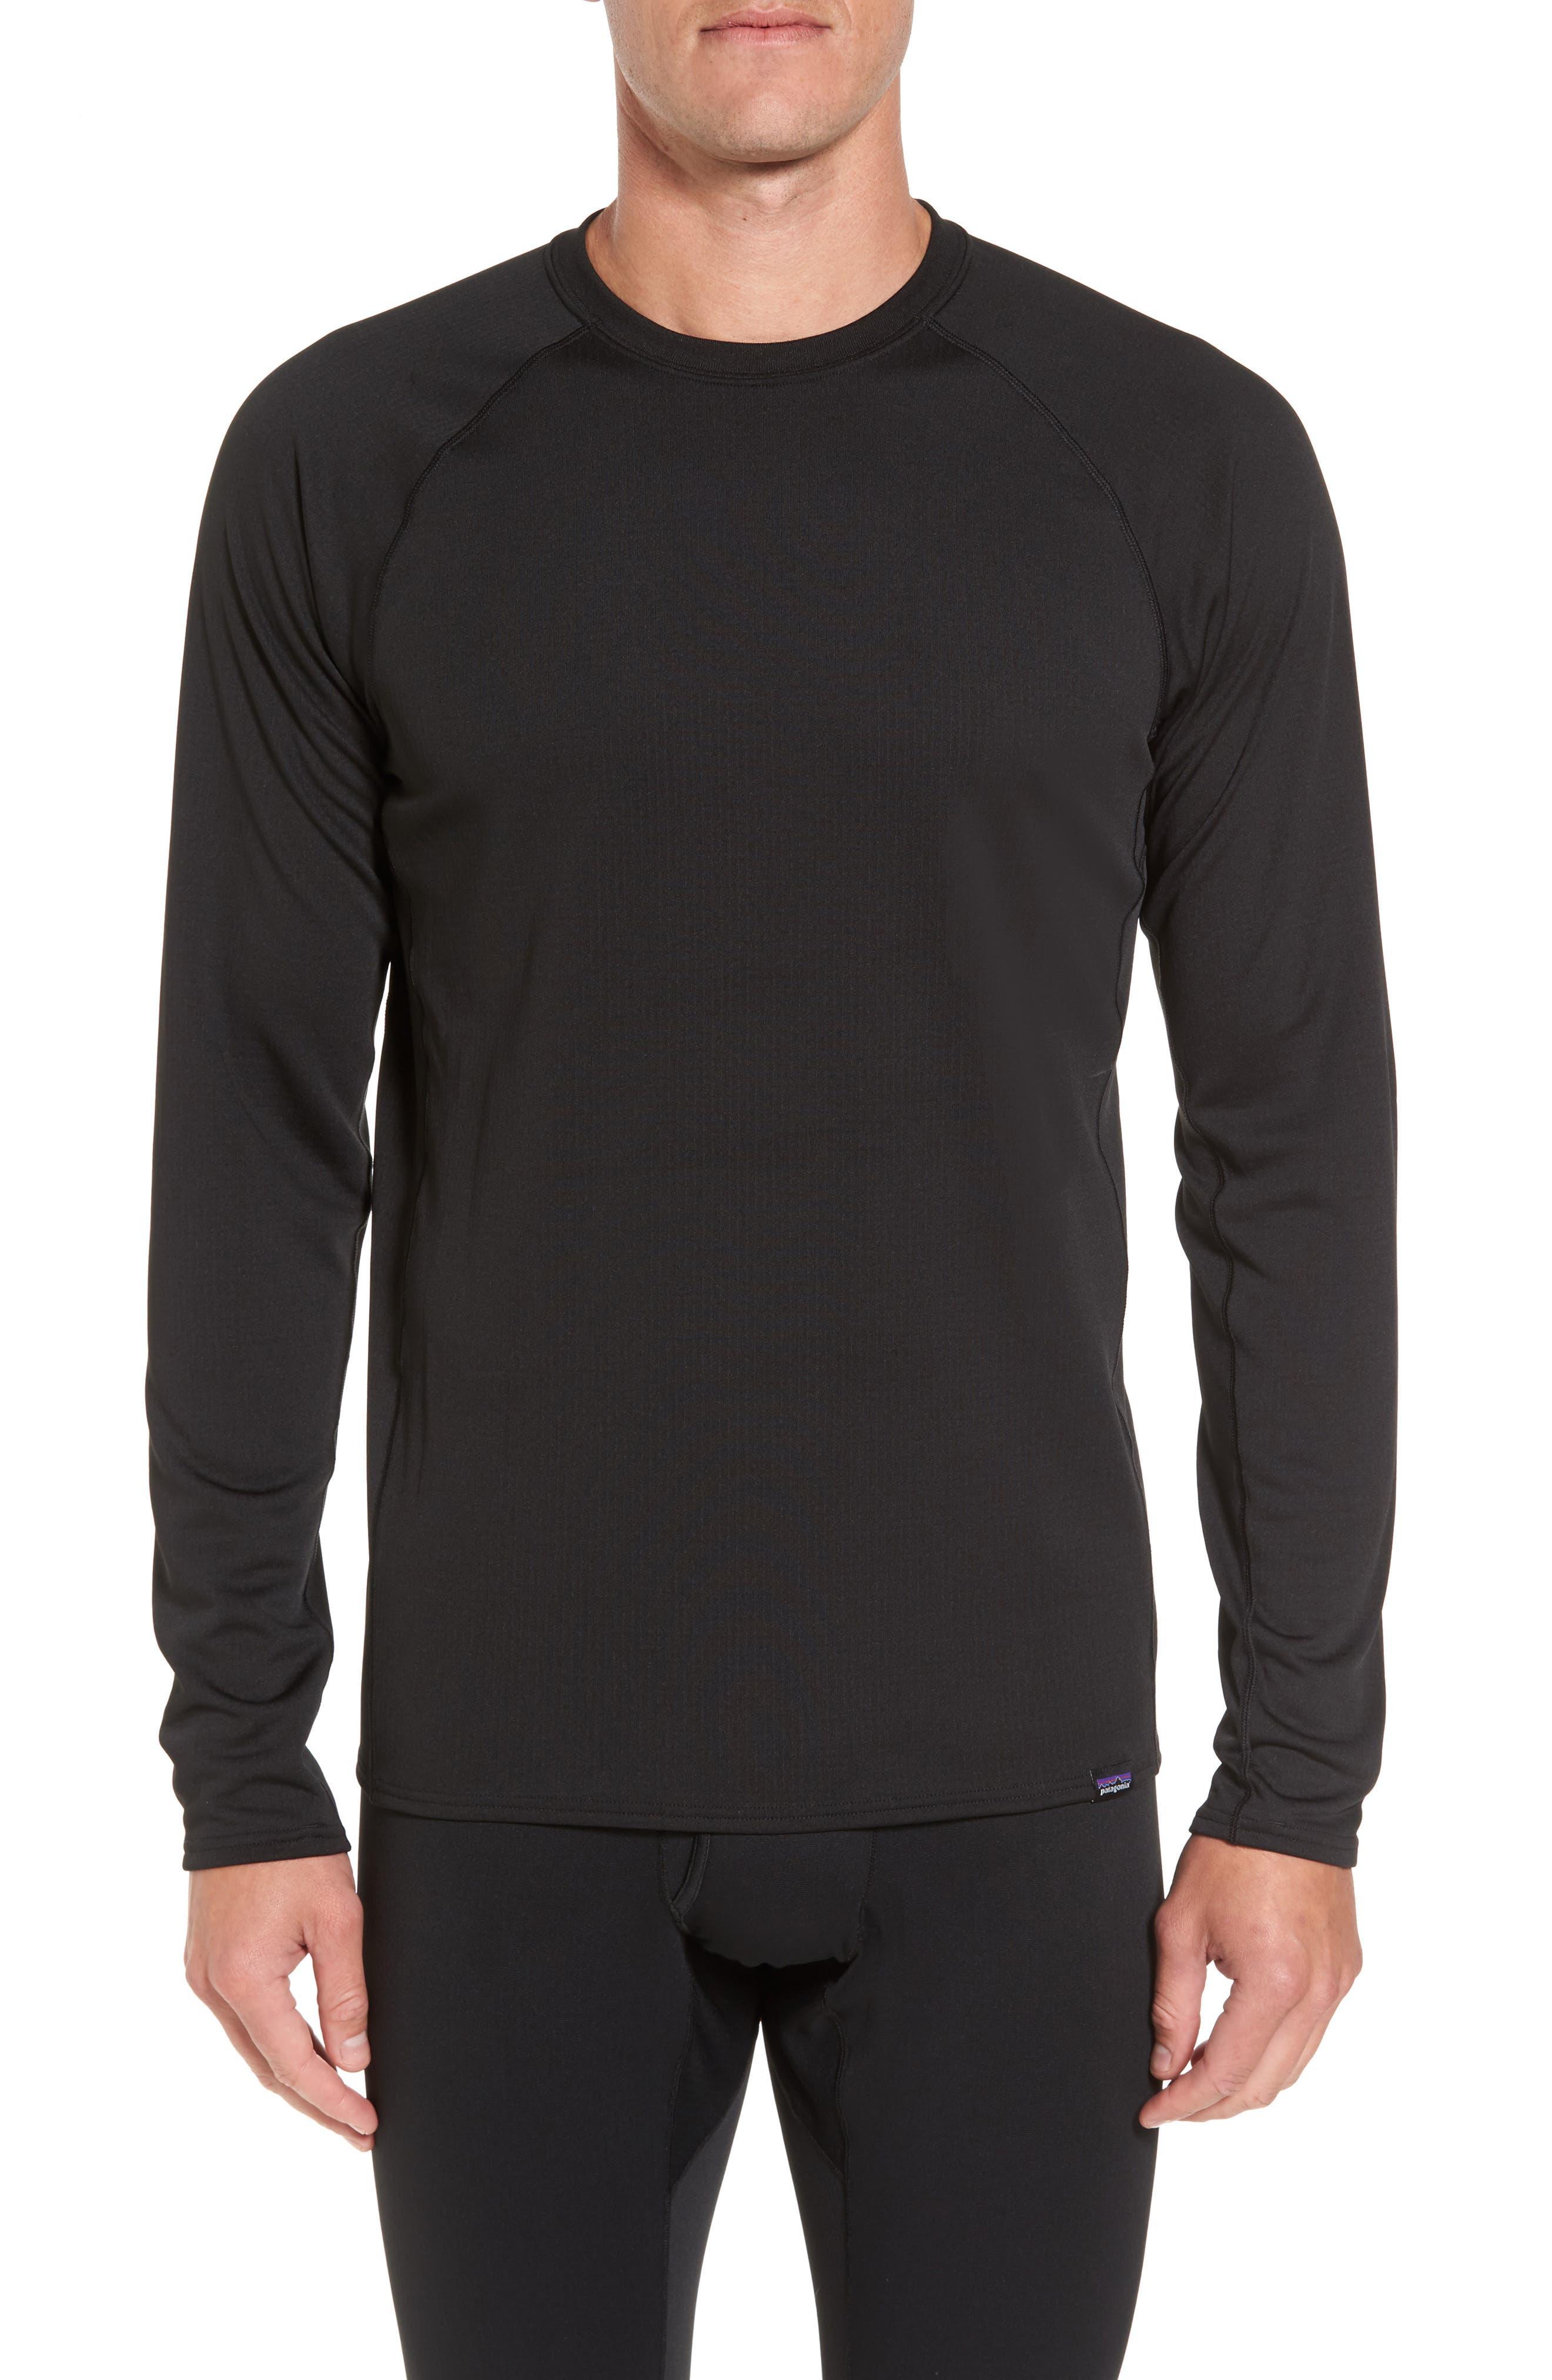 Capilene Midweight Base Layer T-Shirt,                             Main thumbnail 1, color,                             001